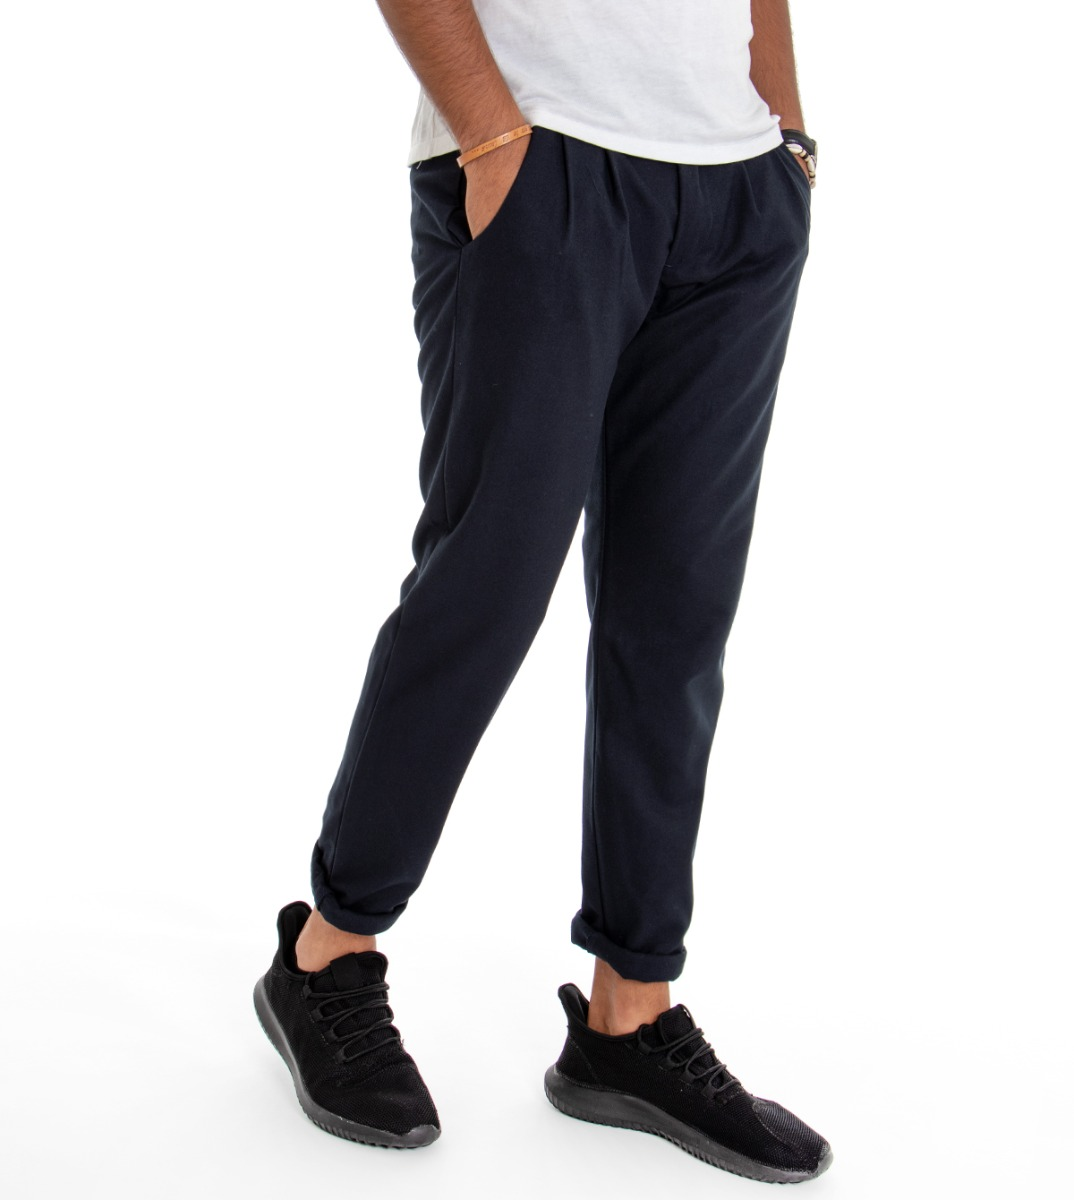 Pantalone-Uomo-con-Pence-Tasca-America-Blu-Tinta-Unita-Cavallo-Basso-Regular miniatura 4